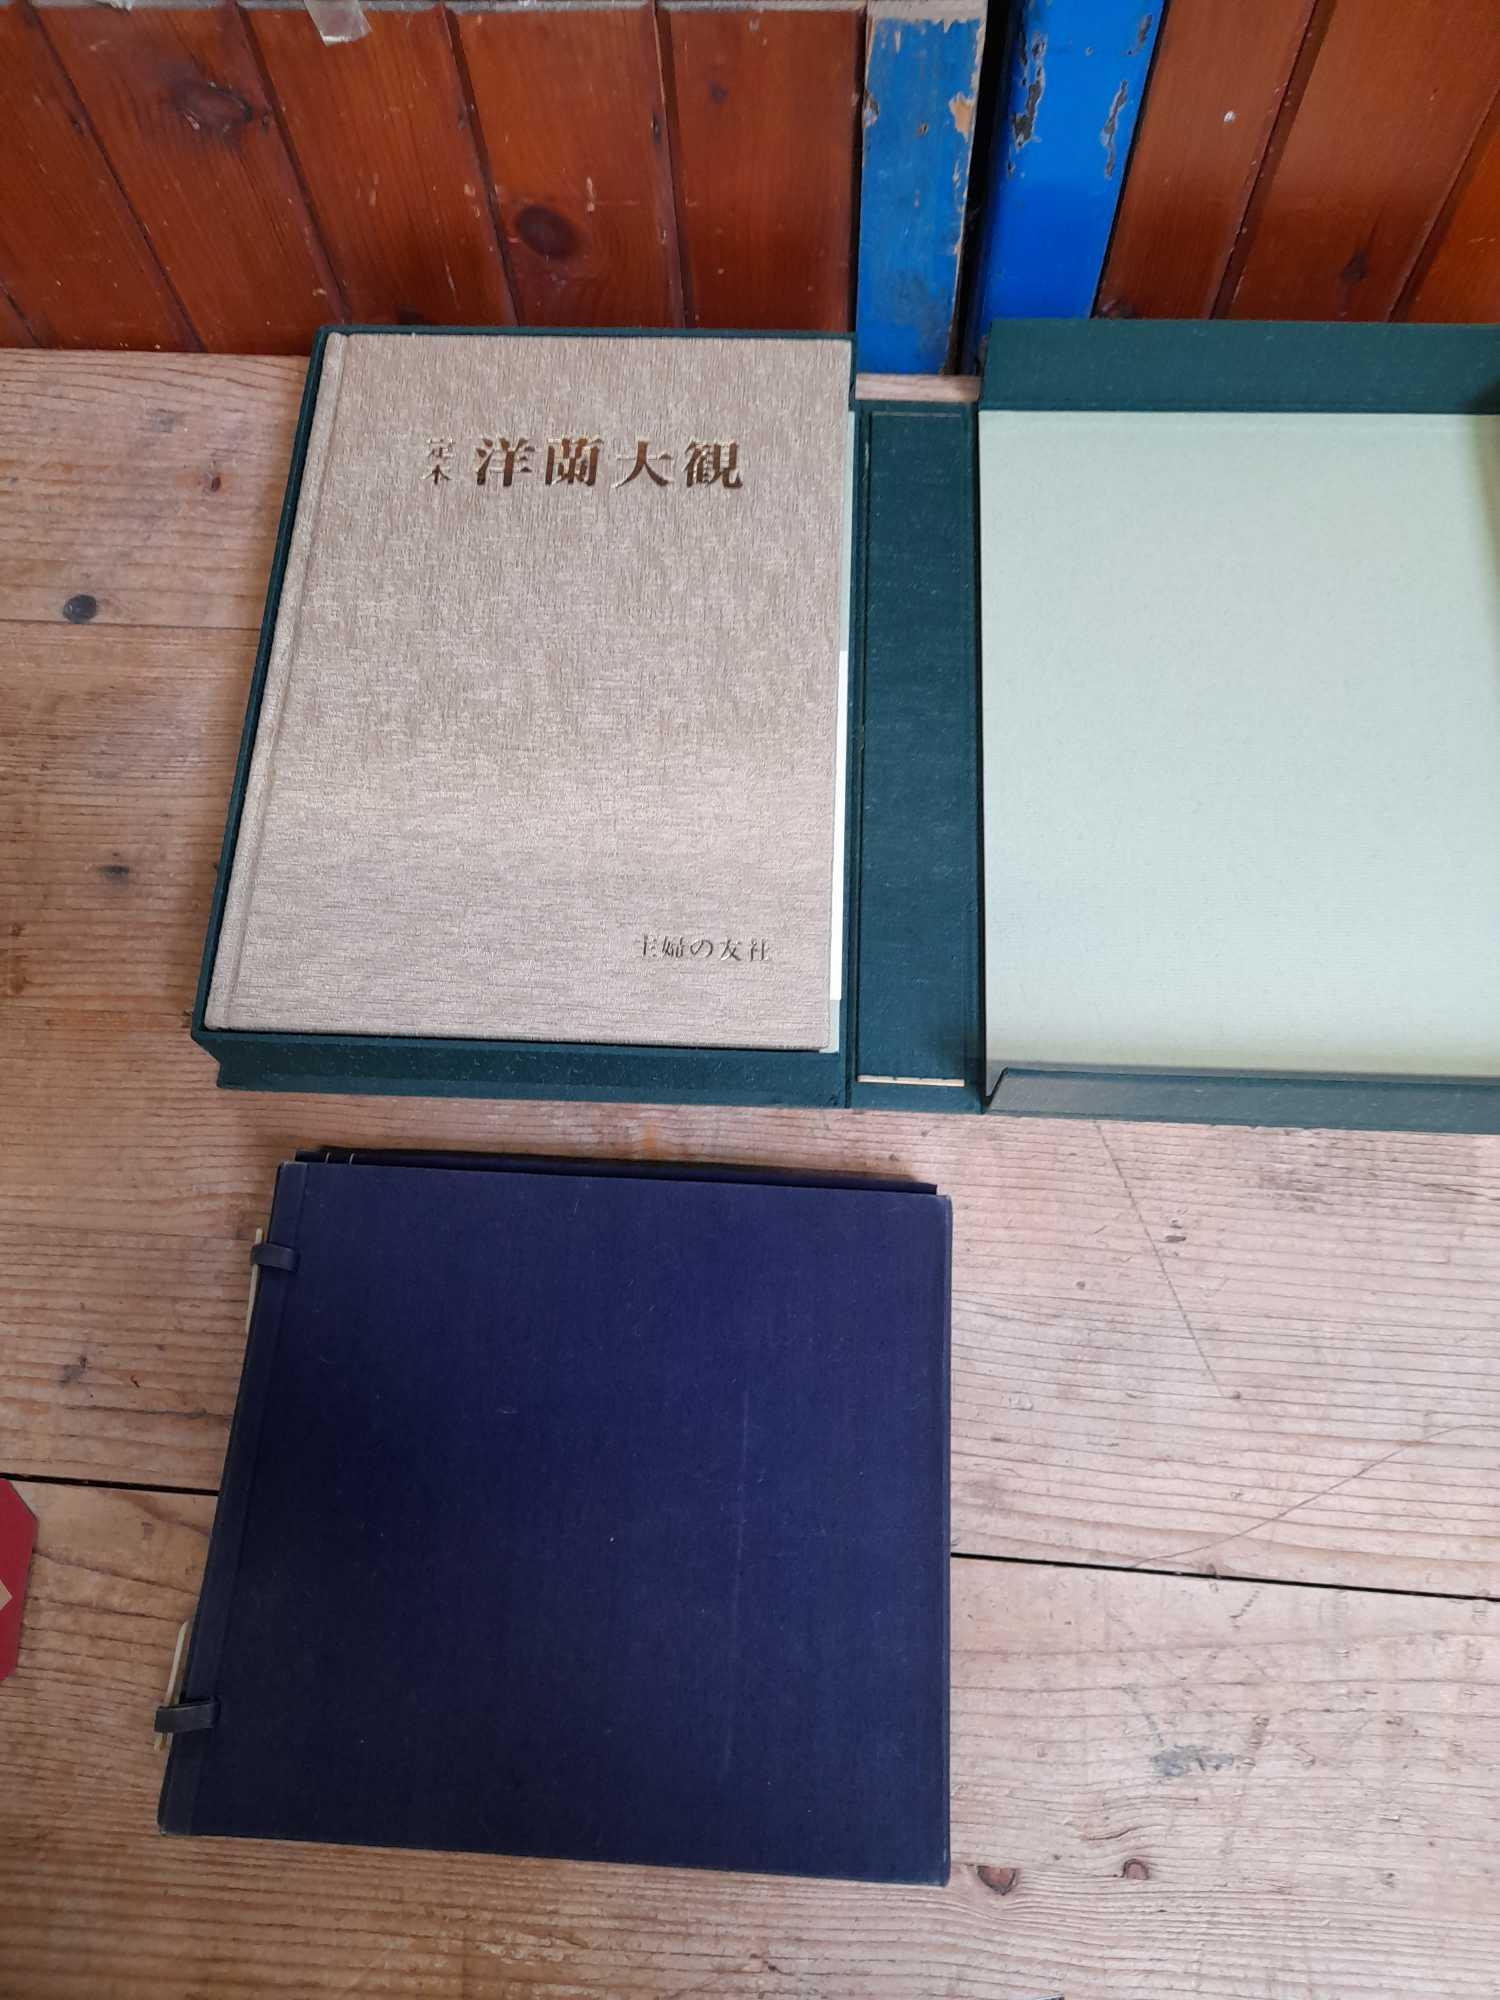 2 ORIENTAL BOOKS